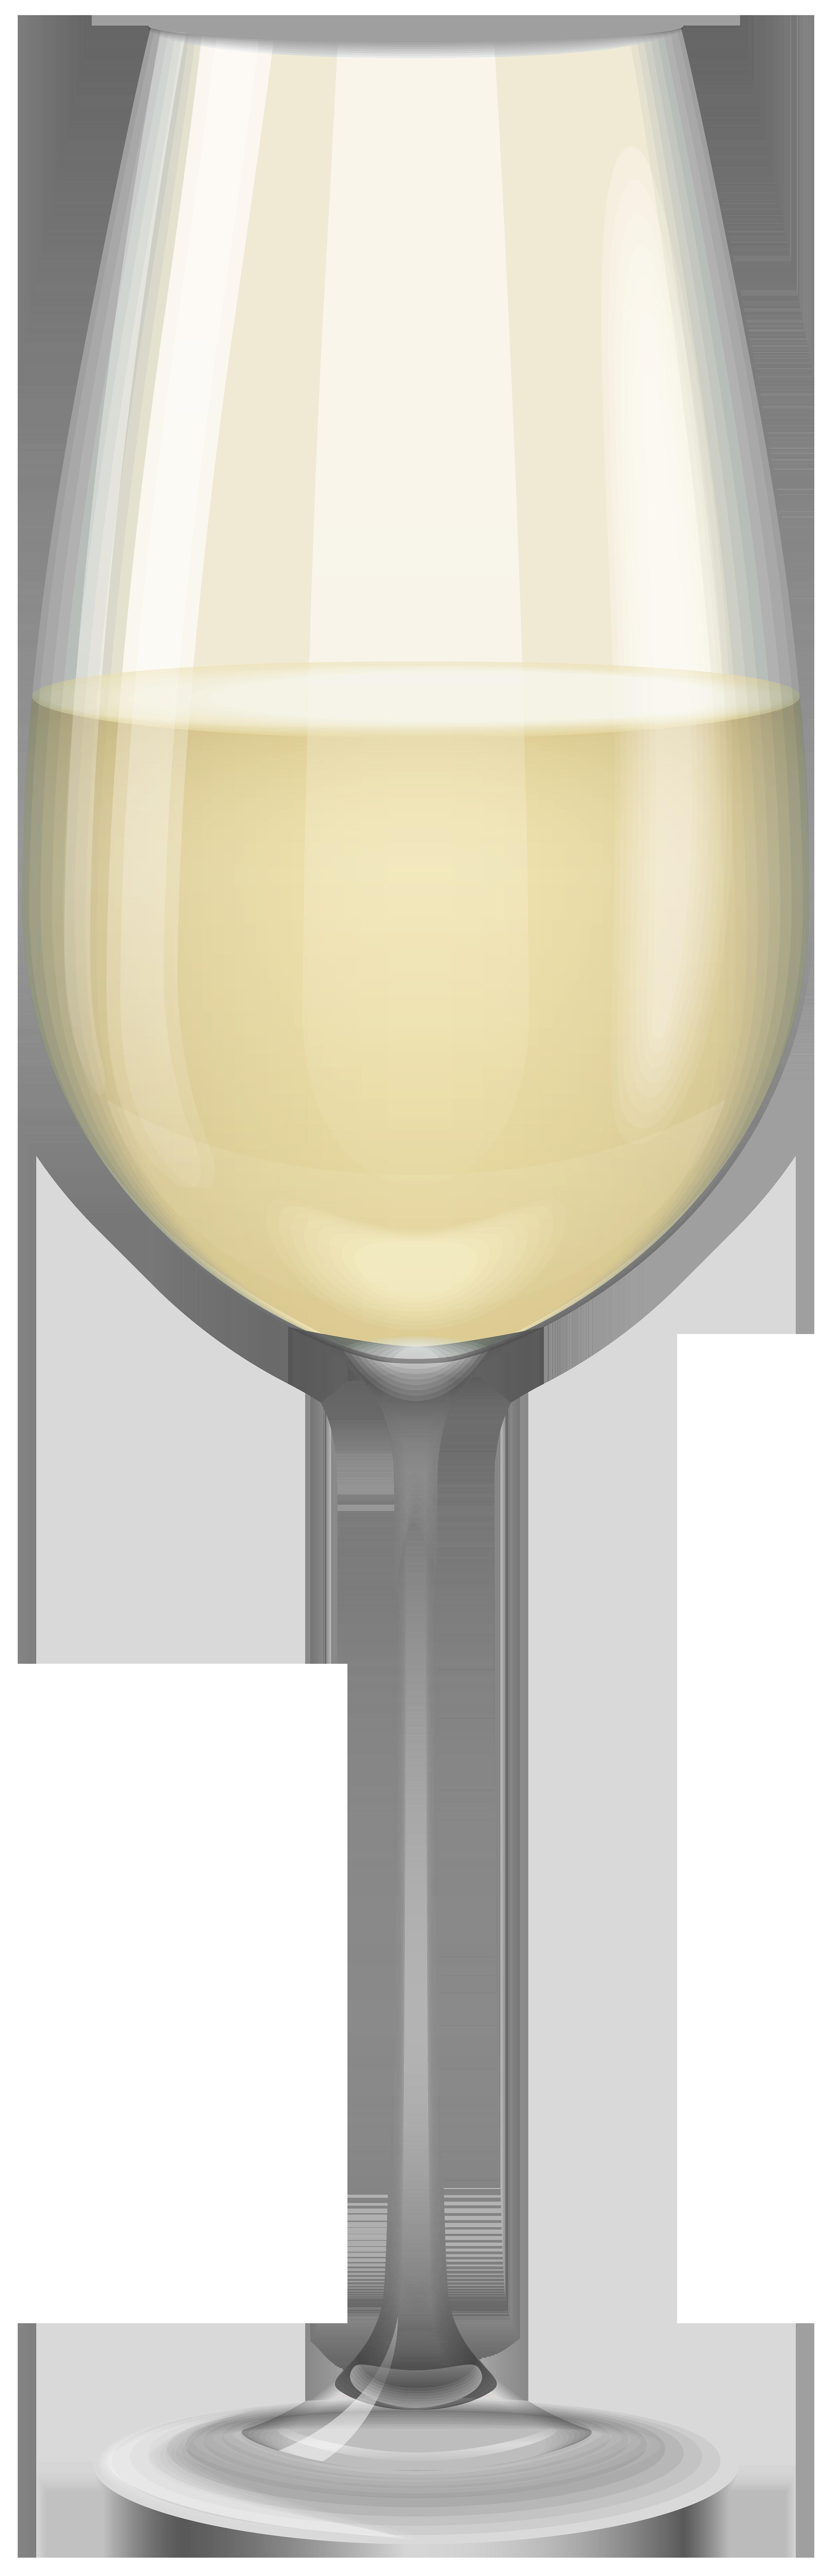 White glass clip art. Clipart halloween wine